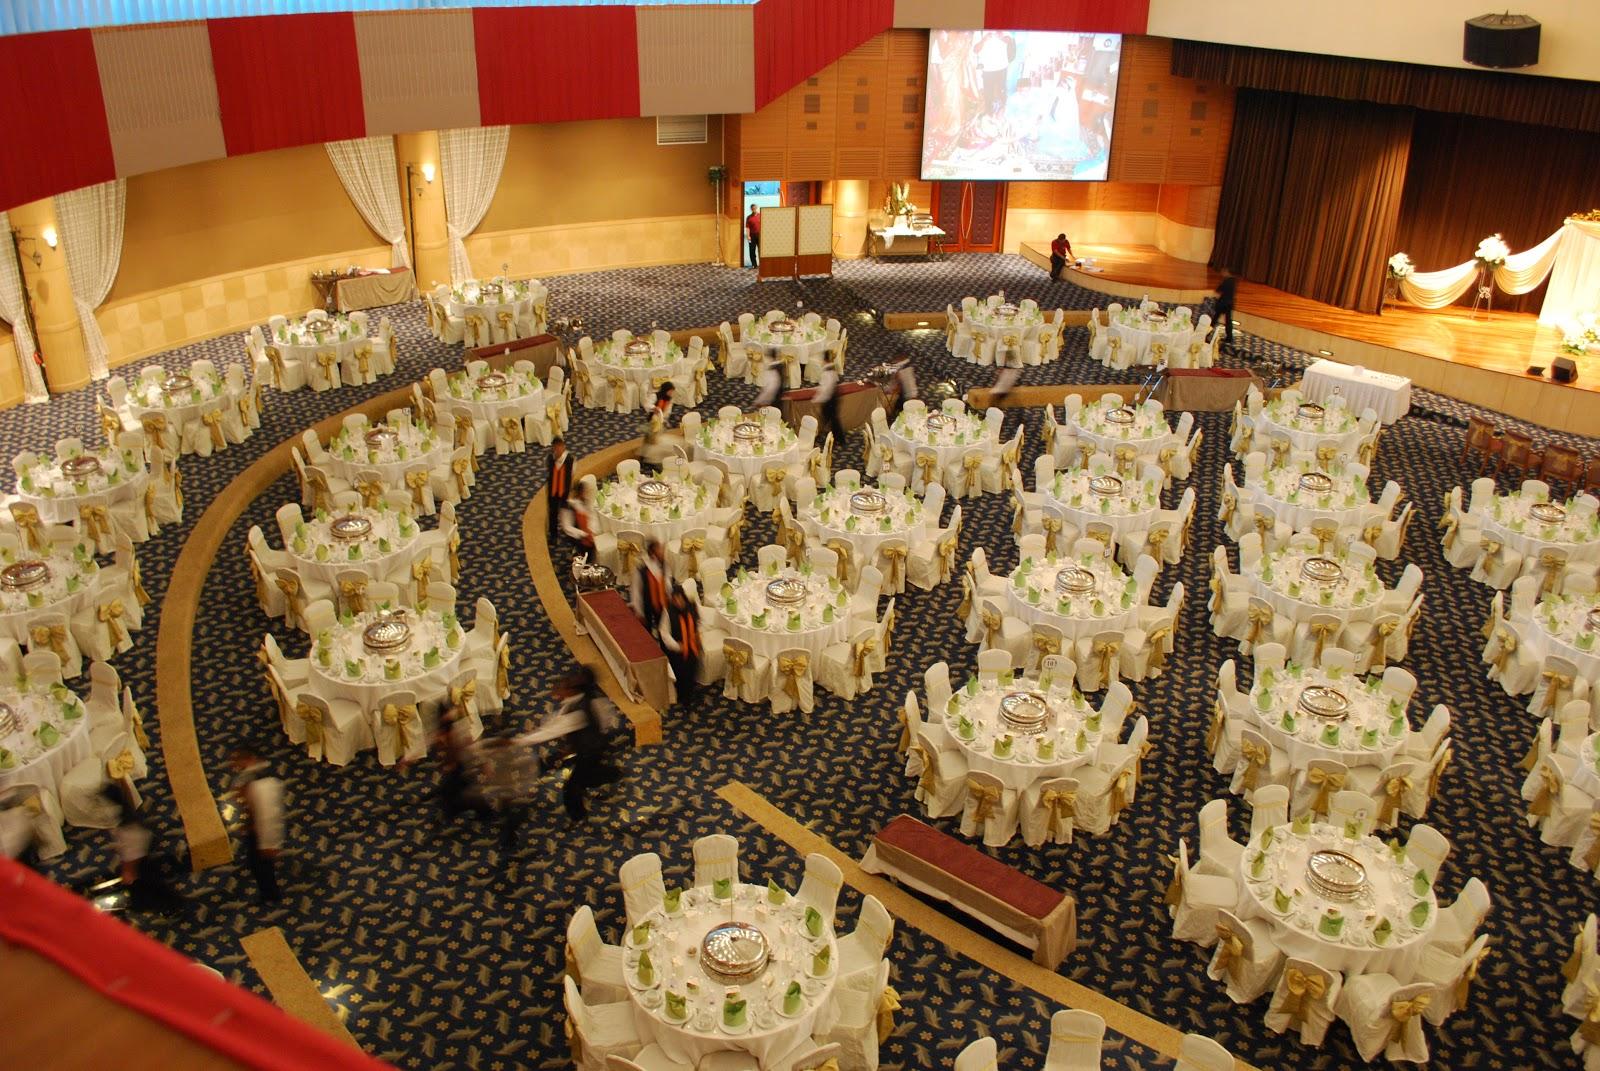 Dewan Perdana Felda Gallery